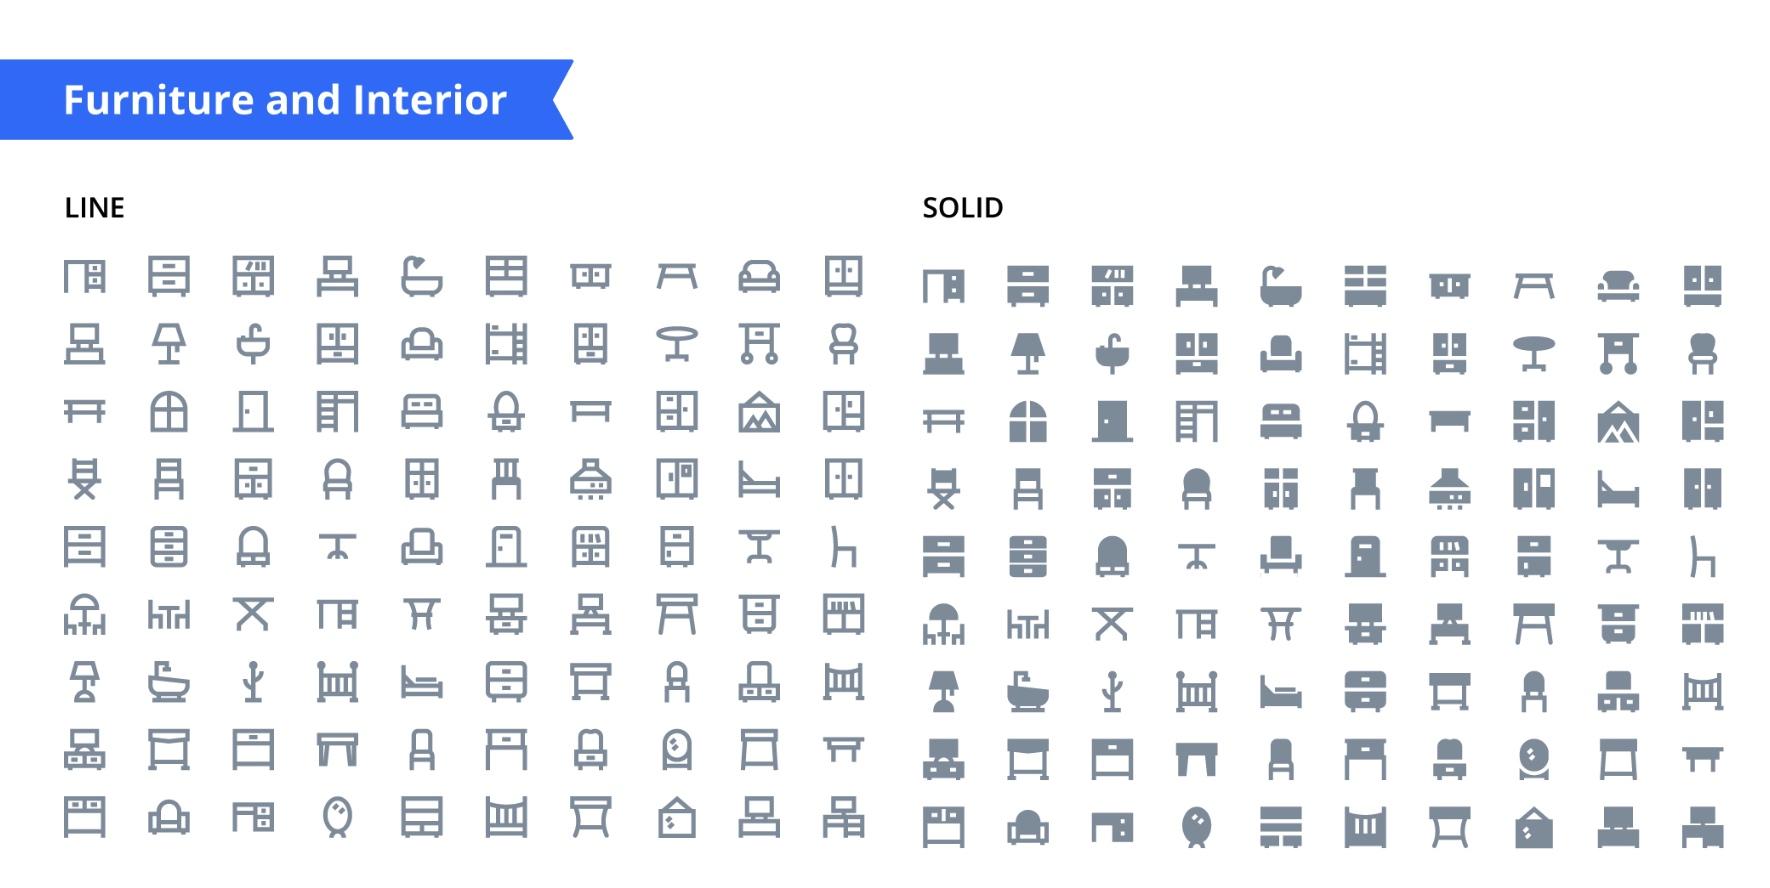 250M共计6000枚Material Design风格icon图标免费下载